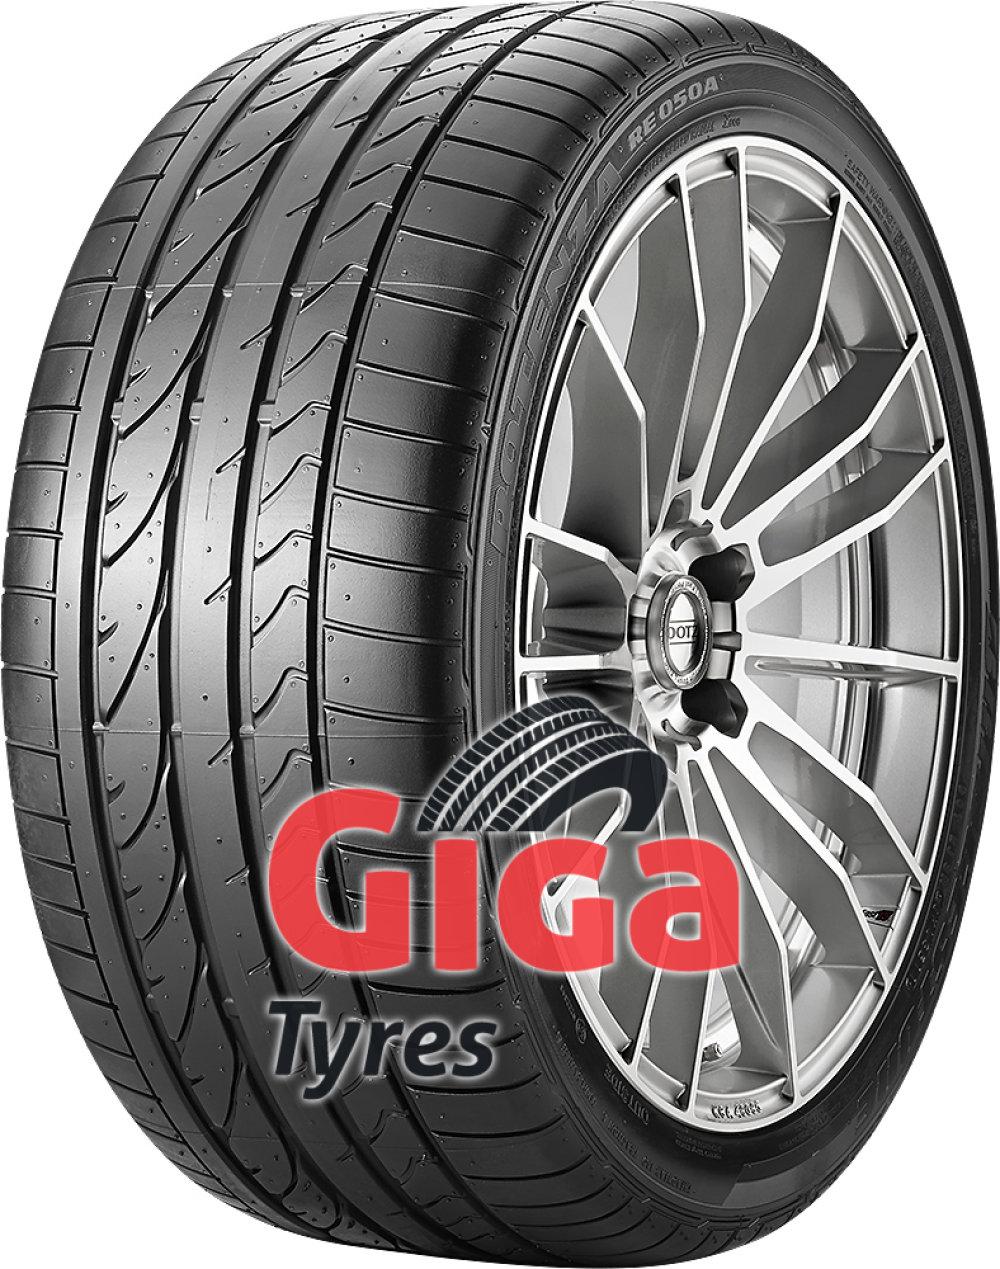 Bridgestone Potenza RE 050 A RFT ( 245/40 R18 93Y runflat, *, with rim protection (MFS) )